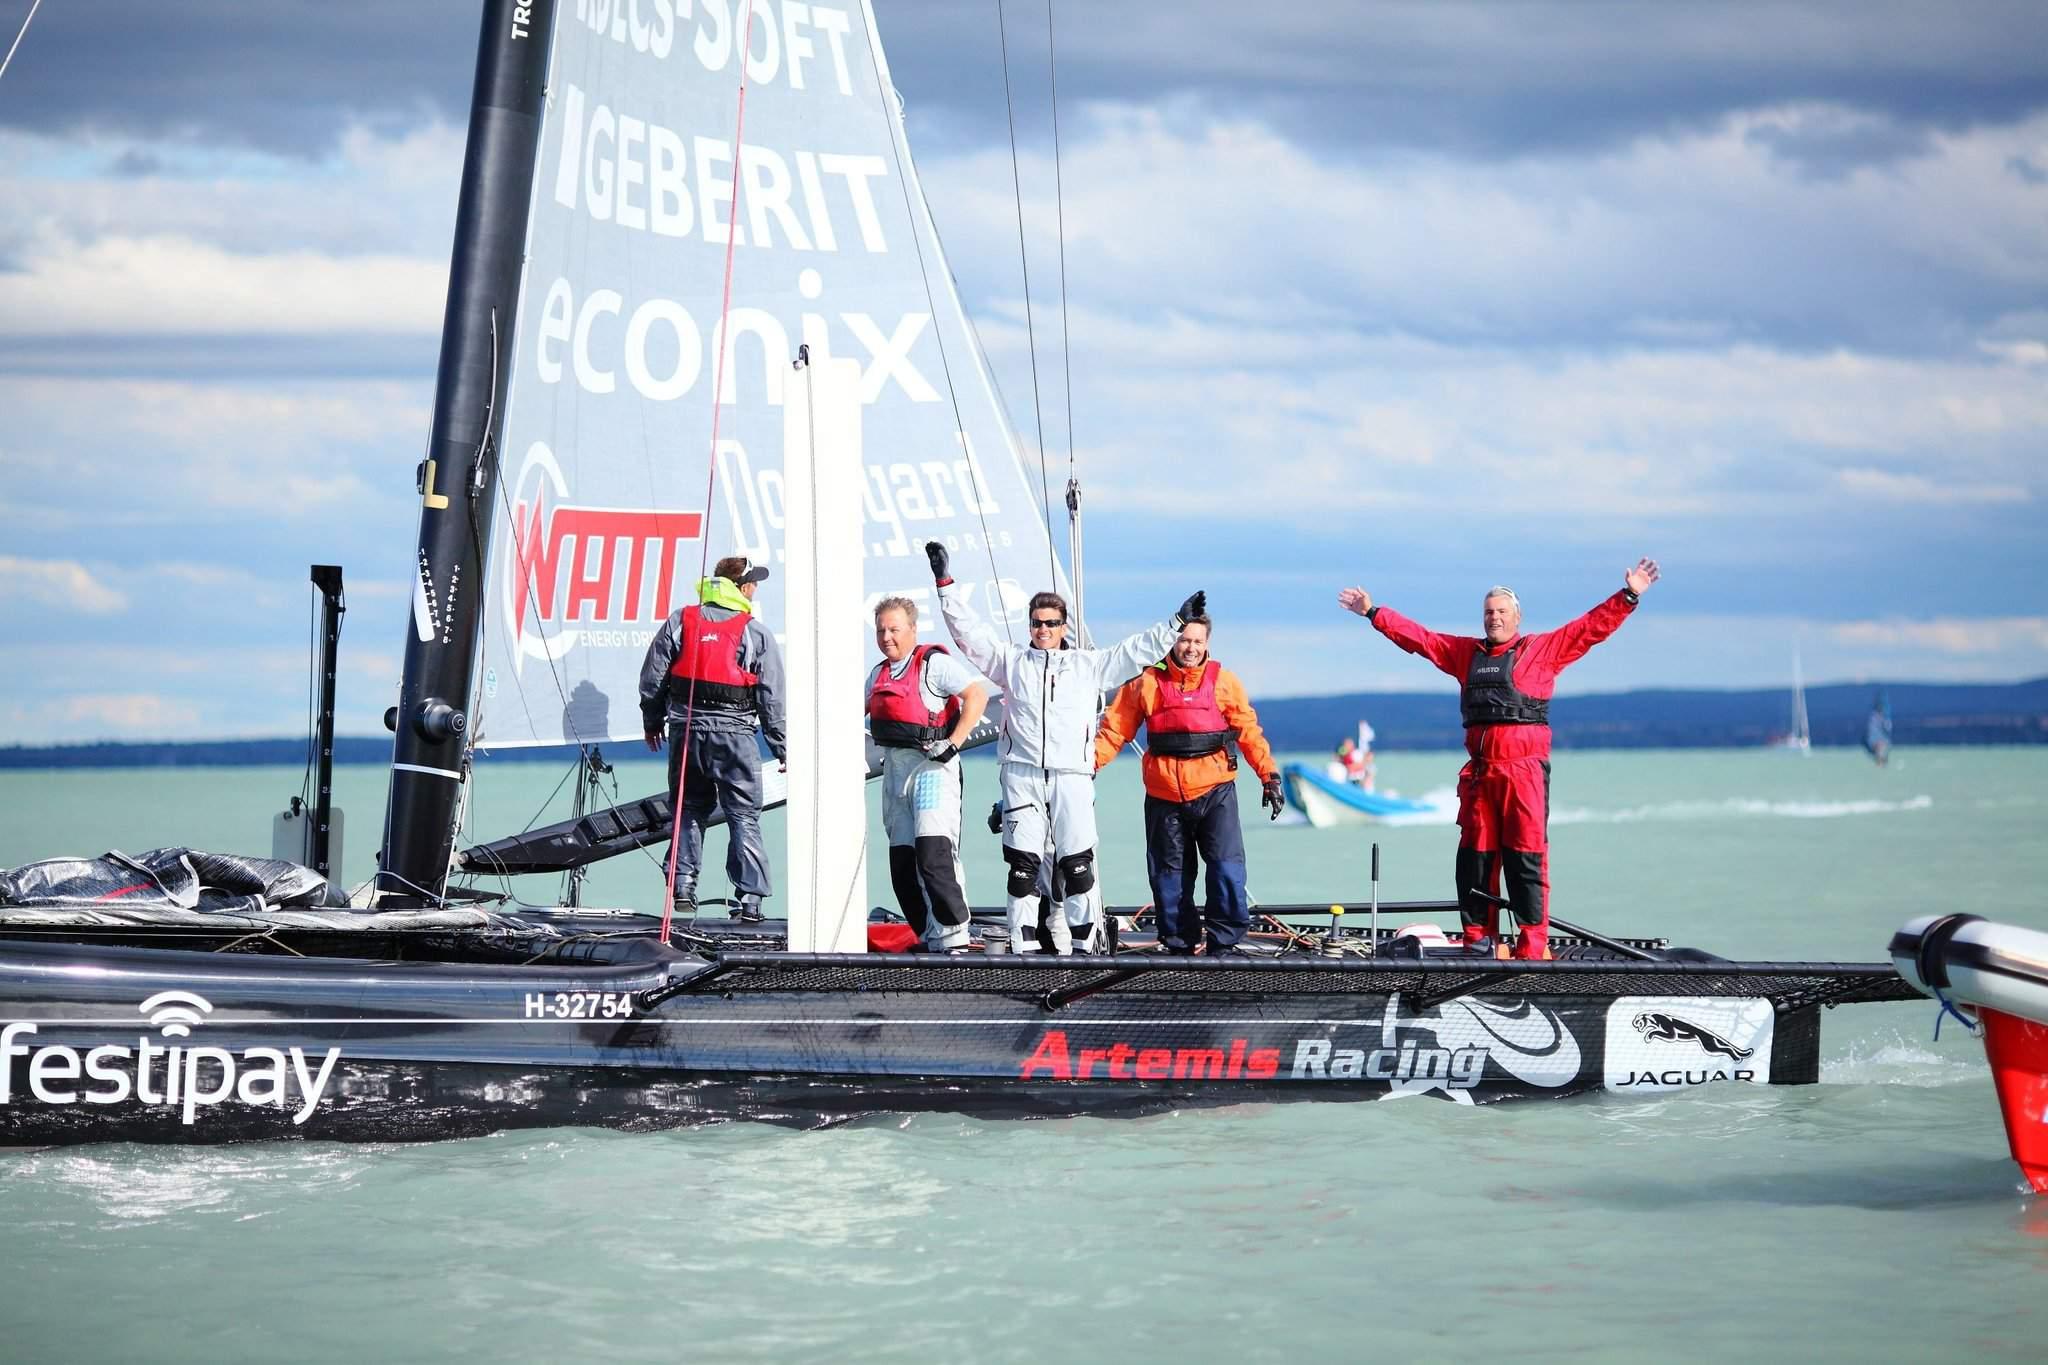 Litkey wins Kékszalag regatta for the 12th time – PHOTO GALLERY